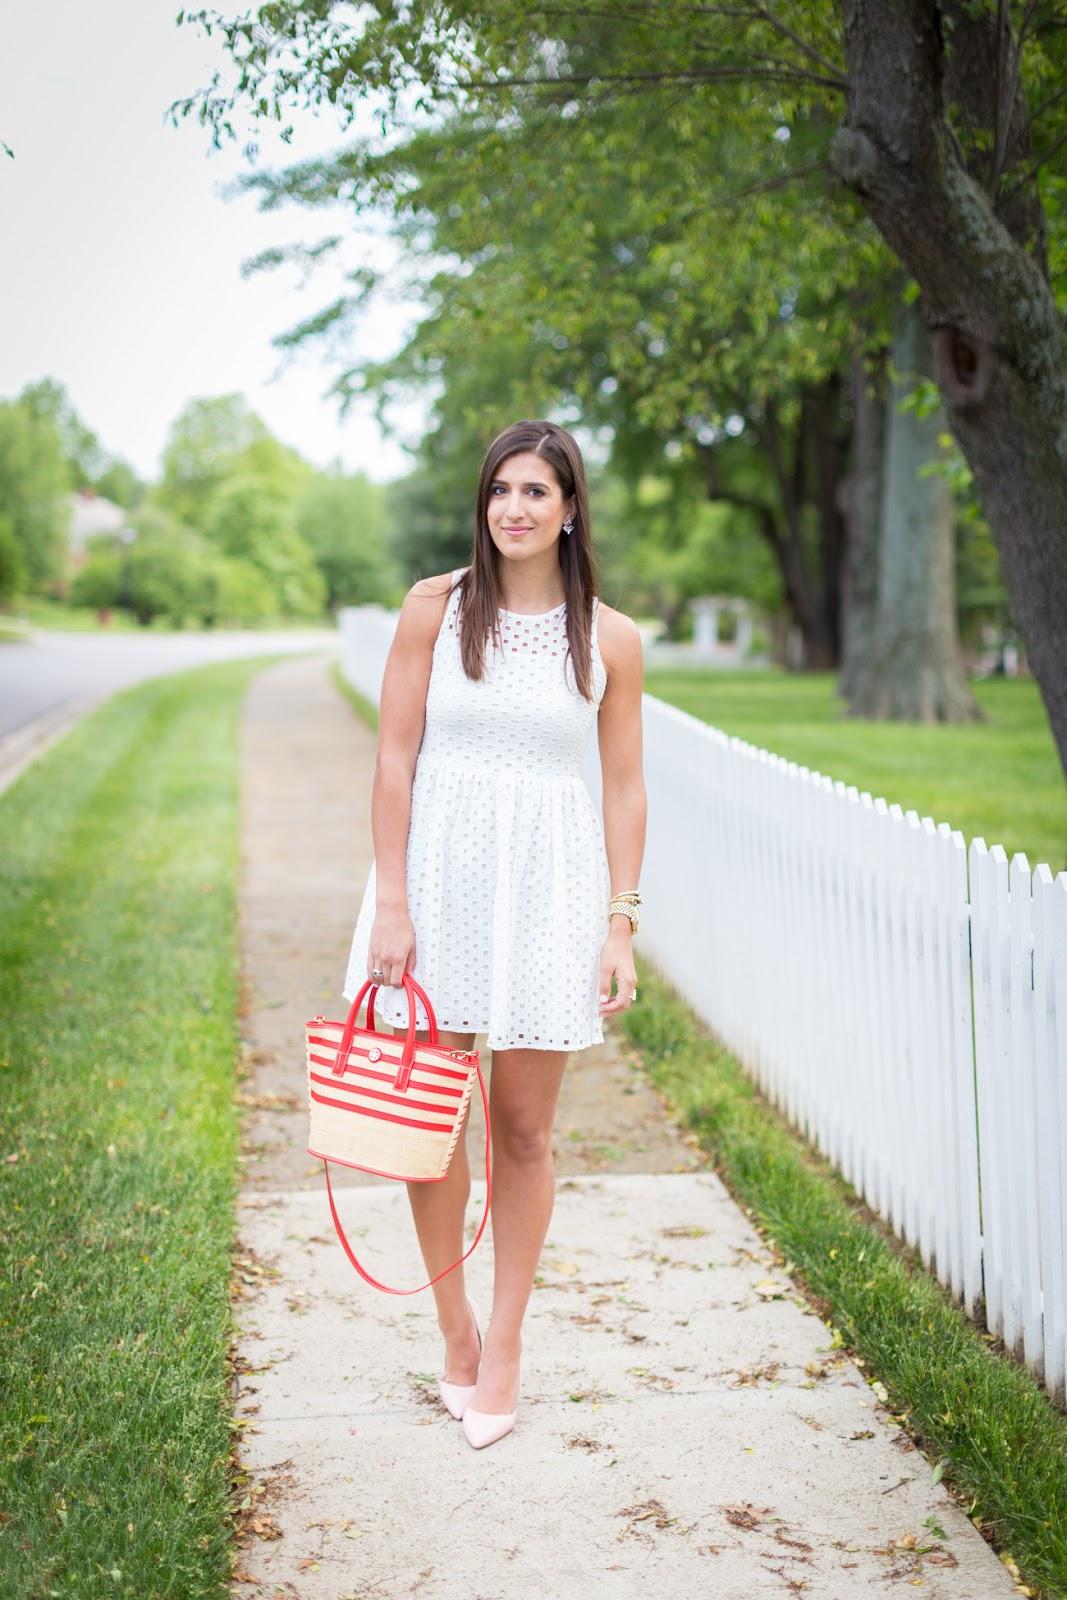 Little White Dresses // A Southern Drawl